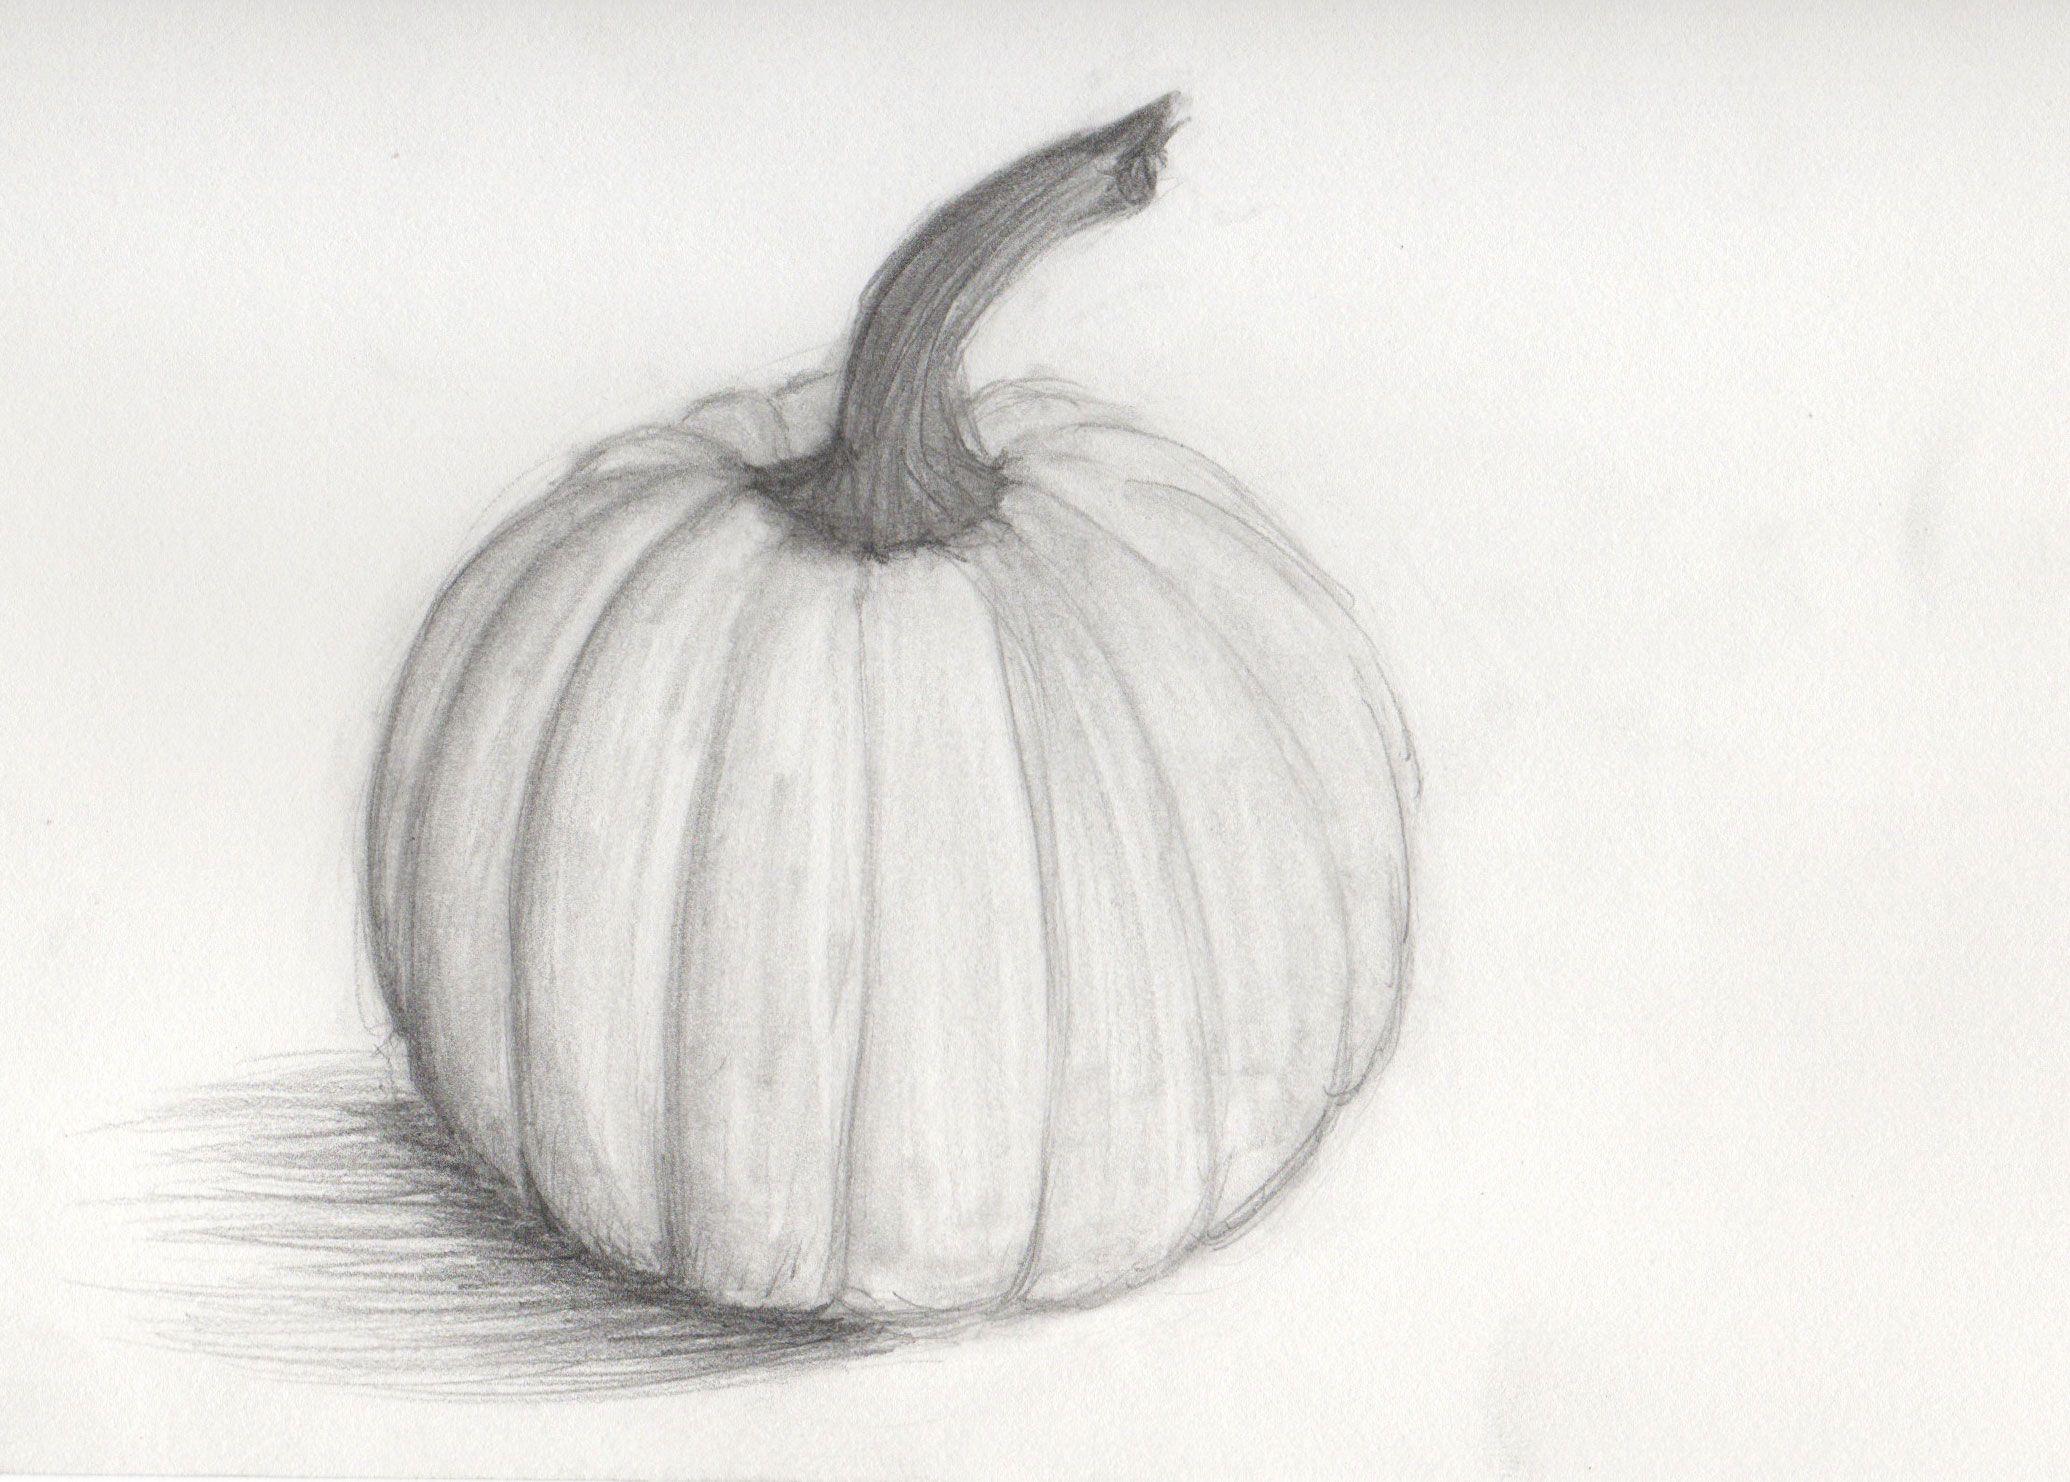 pumpkin drawing with shading. pencil drawings of pumpkins | traditional art sarah j. mora pumpkin drawing with shading d